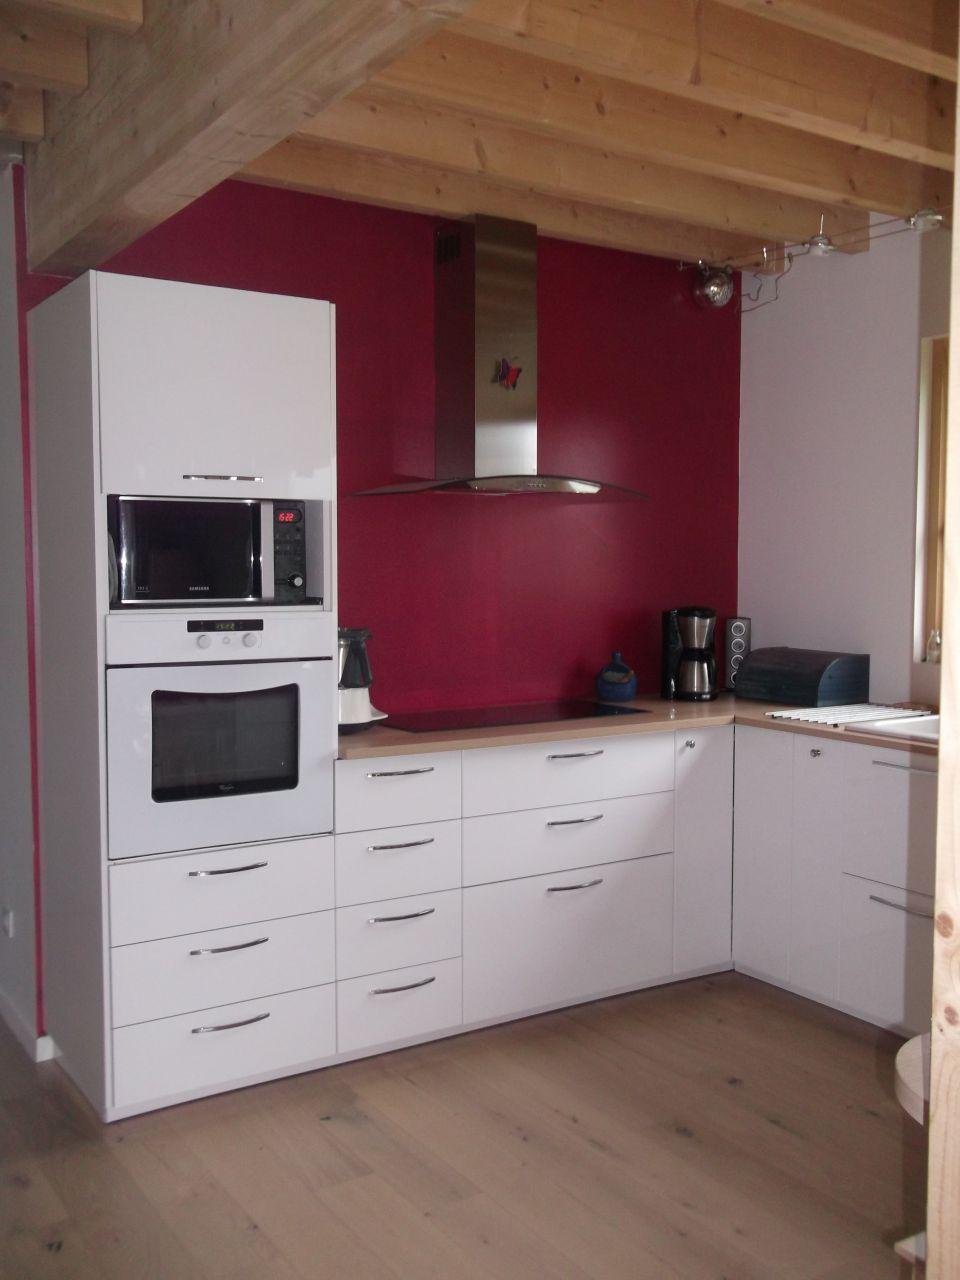 idees de remodelage petite cuisine moderne of meuble hotte ikea jjfar com